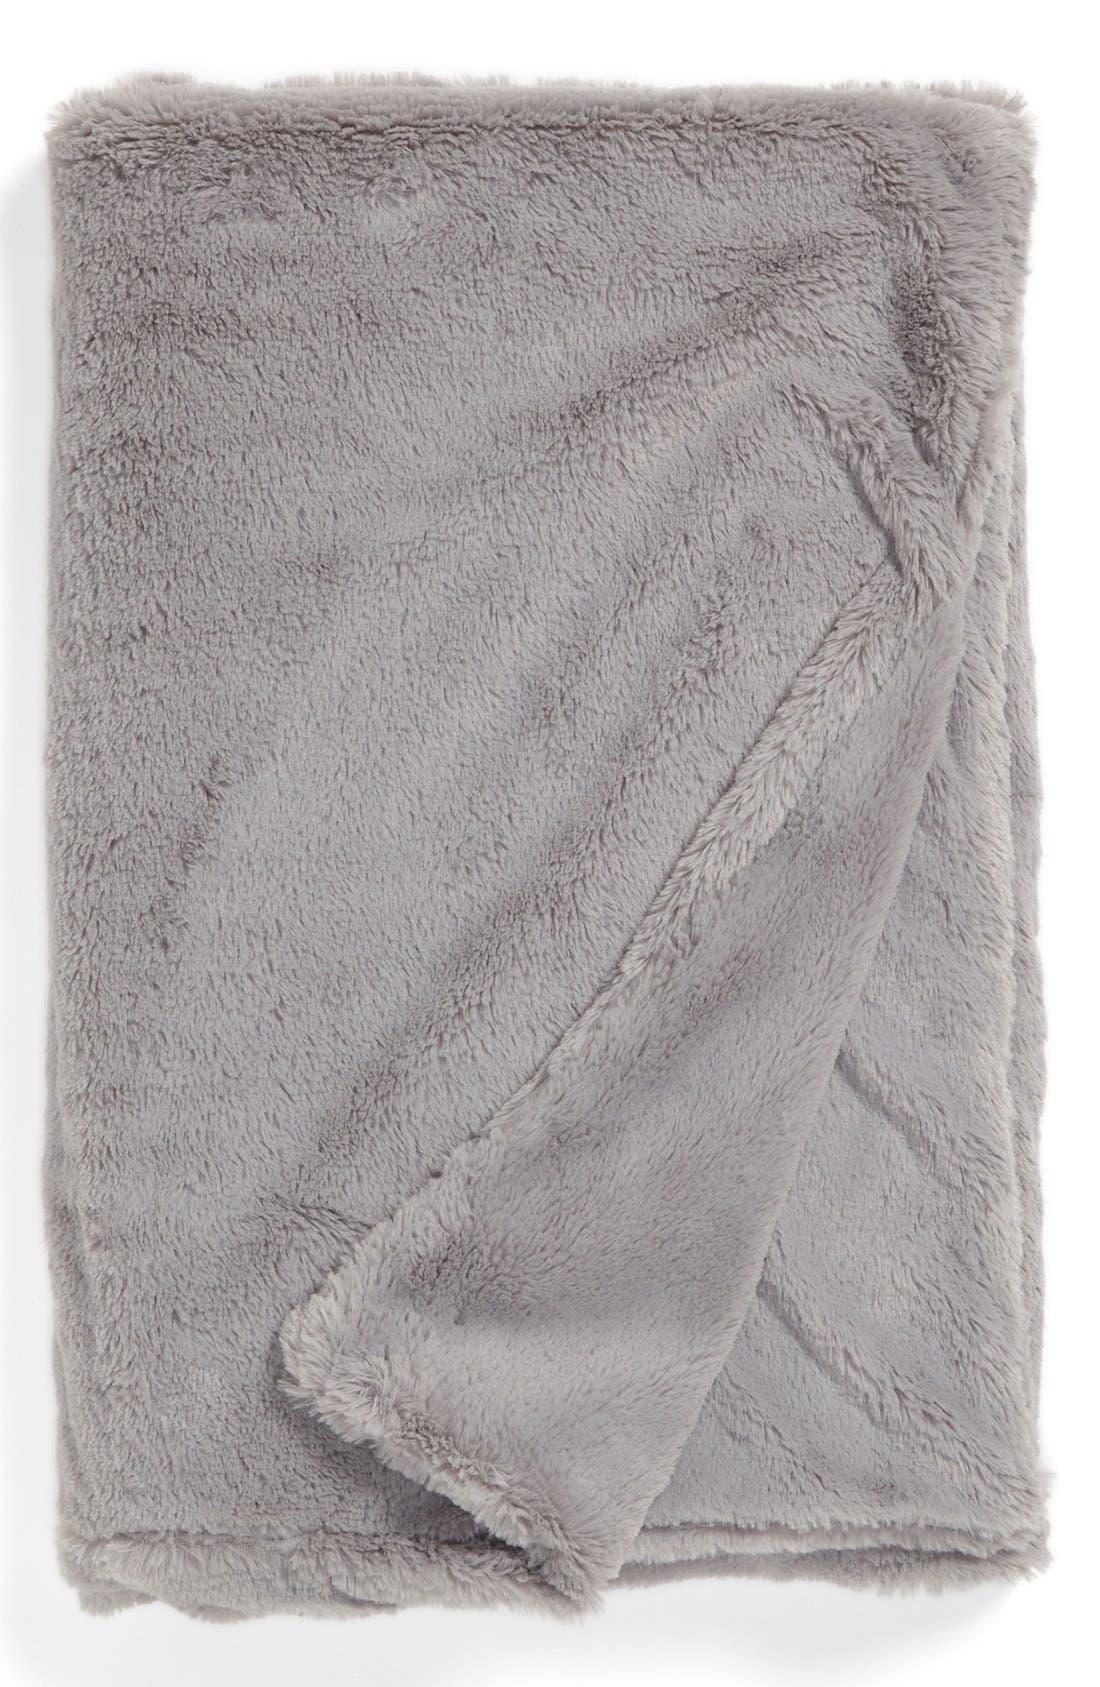 Alternate Image 1 Selected - Inphant Elefant 'Silky' Throw Blanket